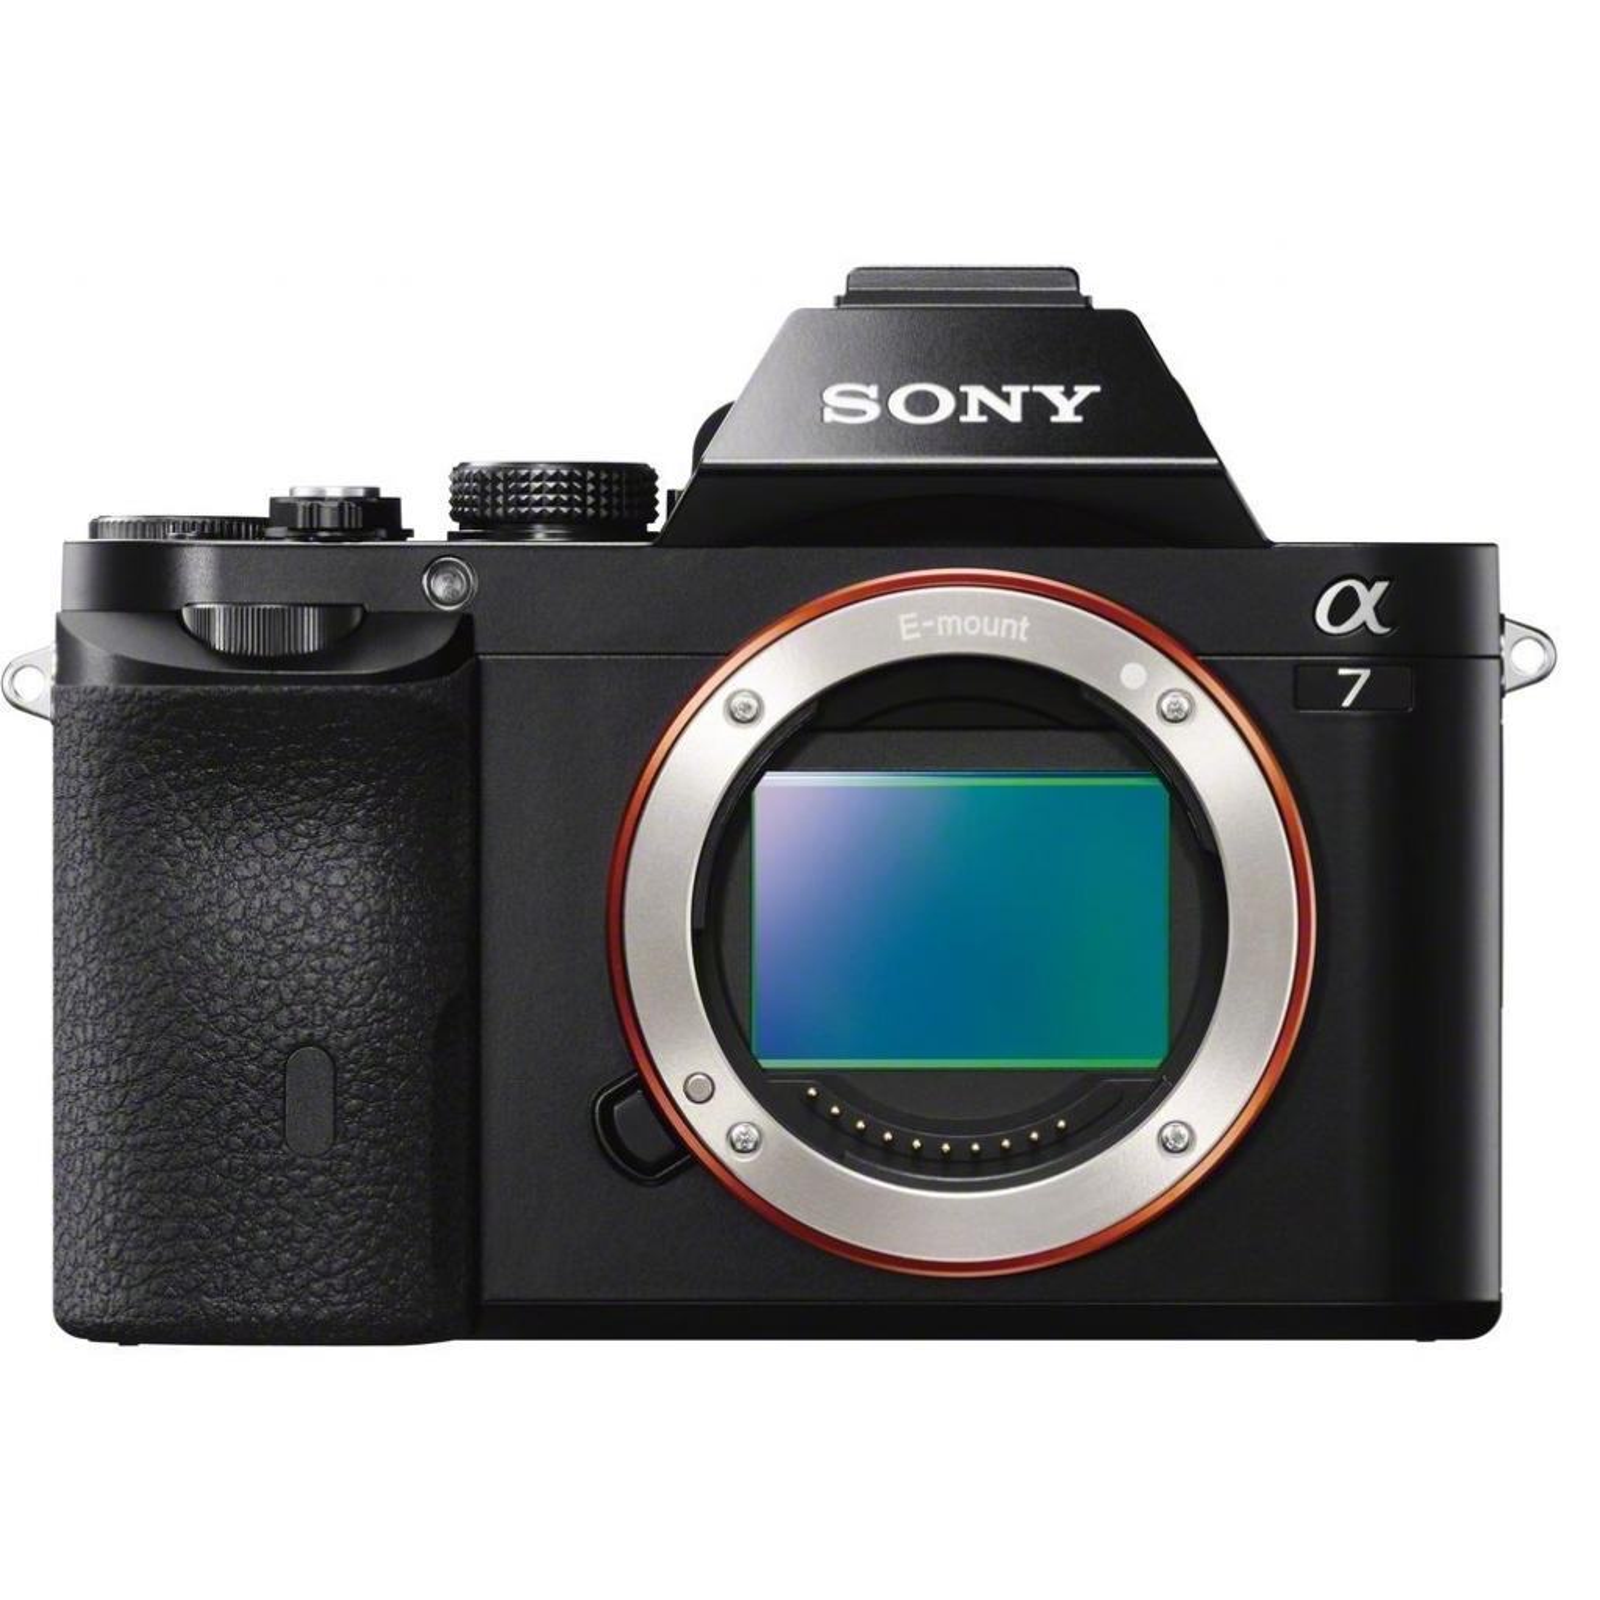 Цифровой фотоаппарат SONY Alpha 7 body black (ILCE7B.RU2)